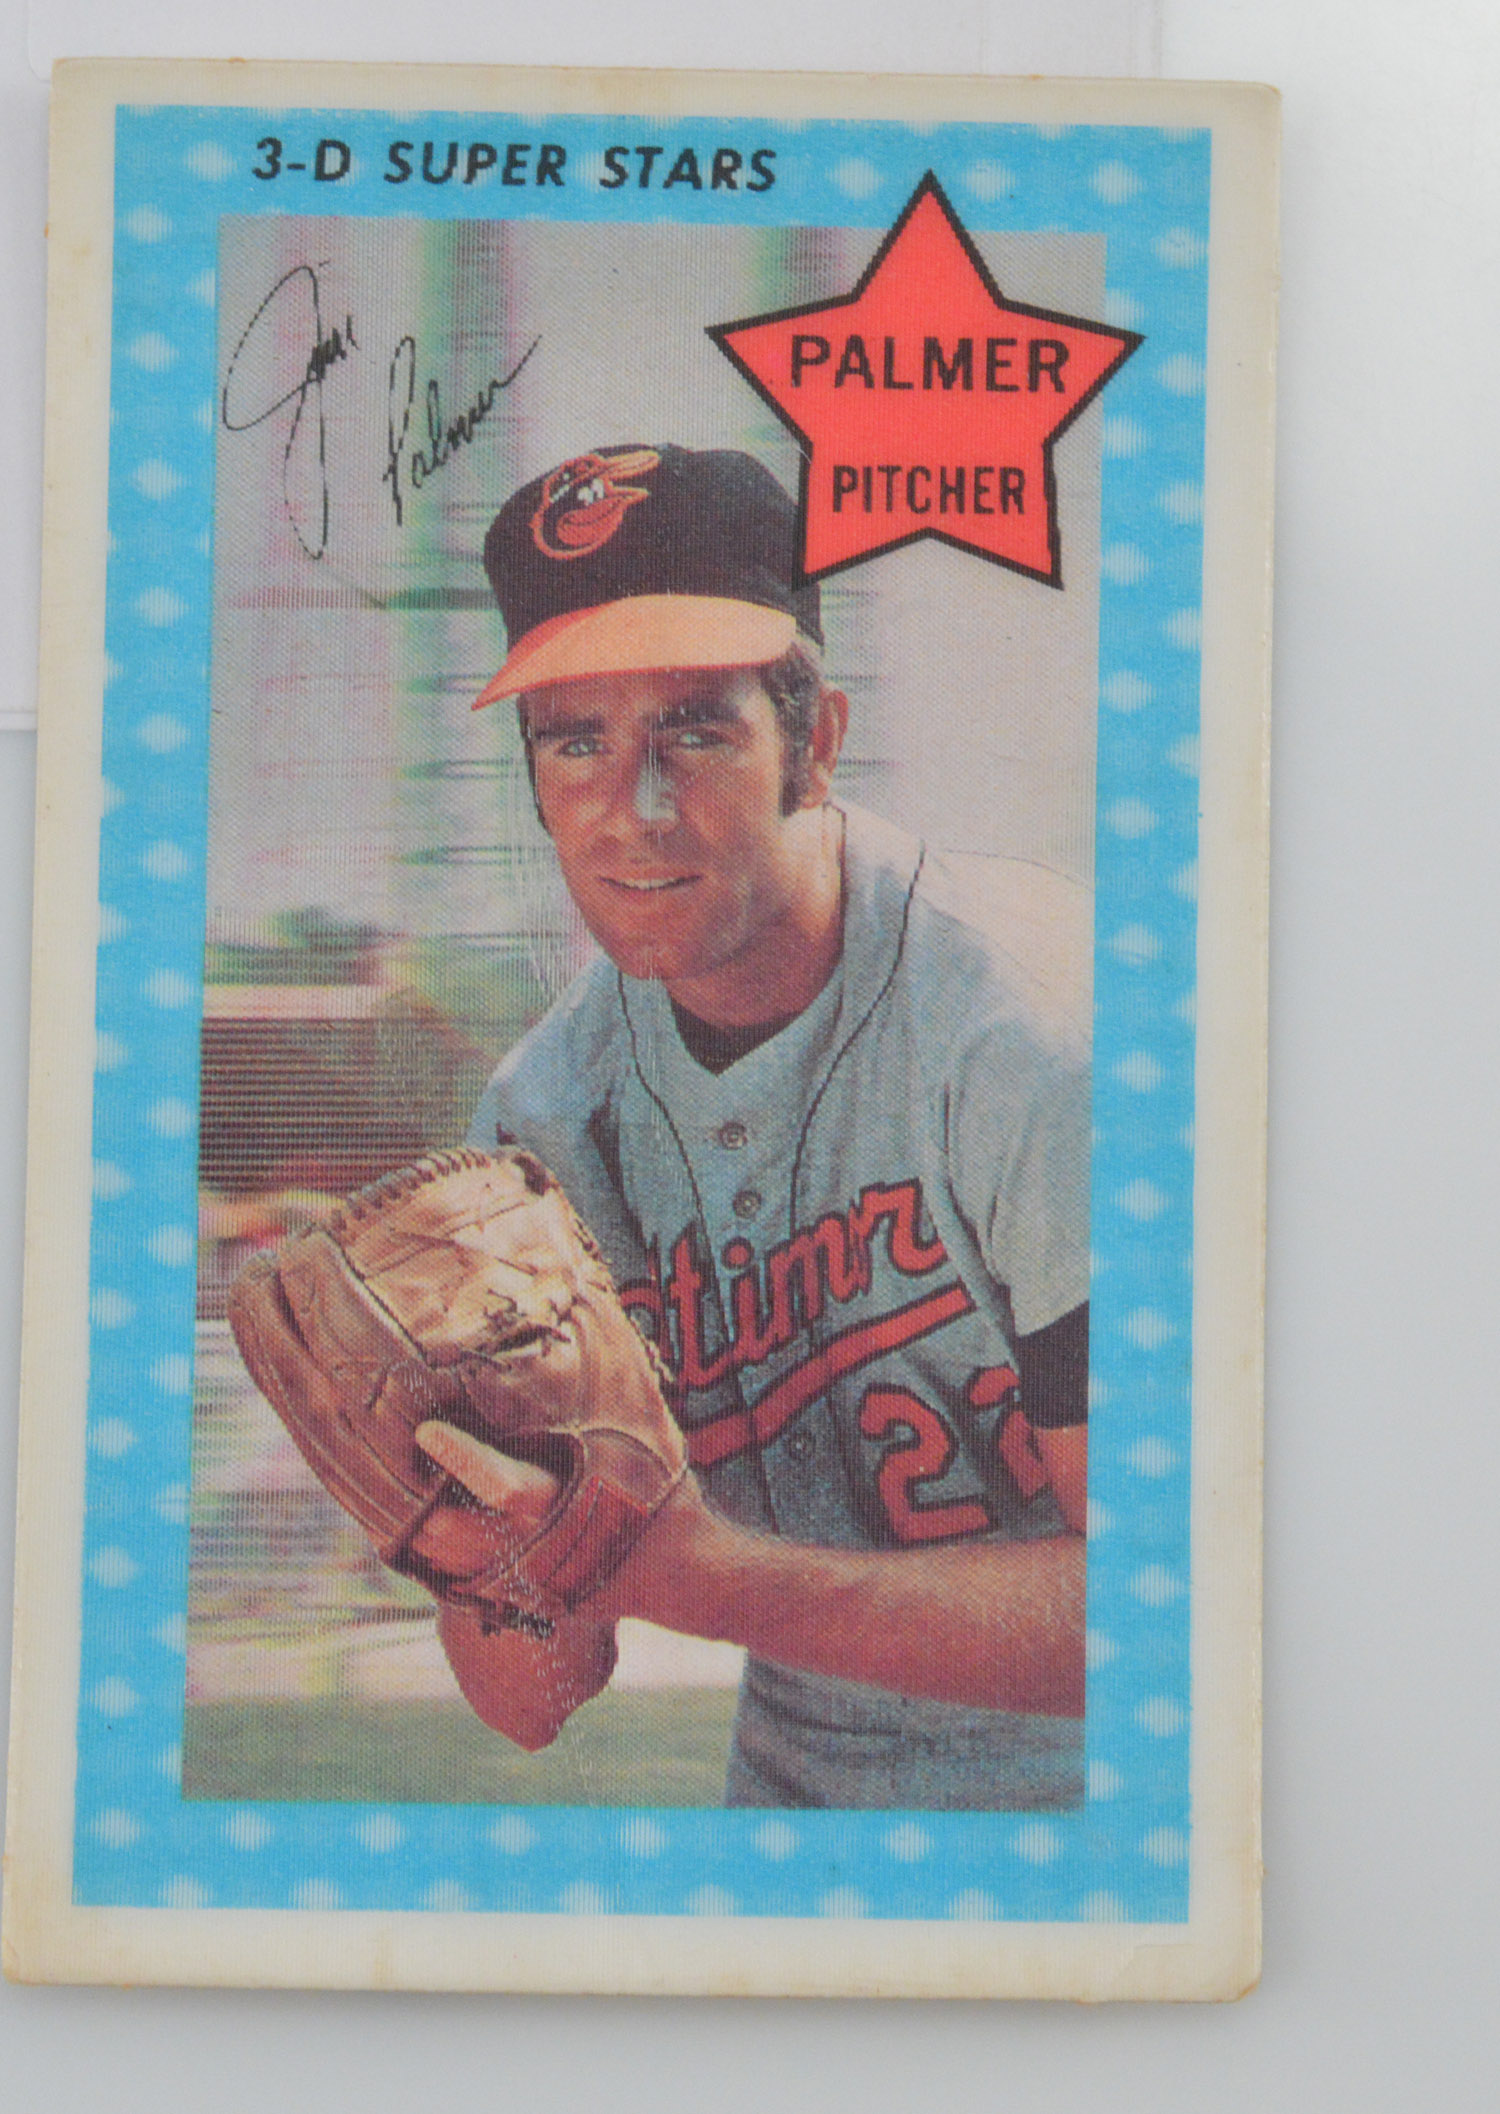 1971 Kelloggs 3 D Super Stars Baseball Card 60 James Palmer